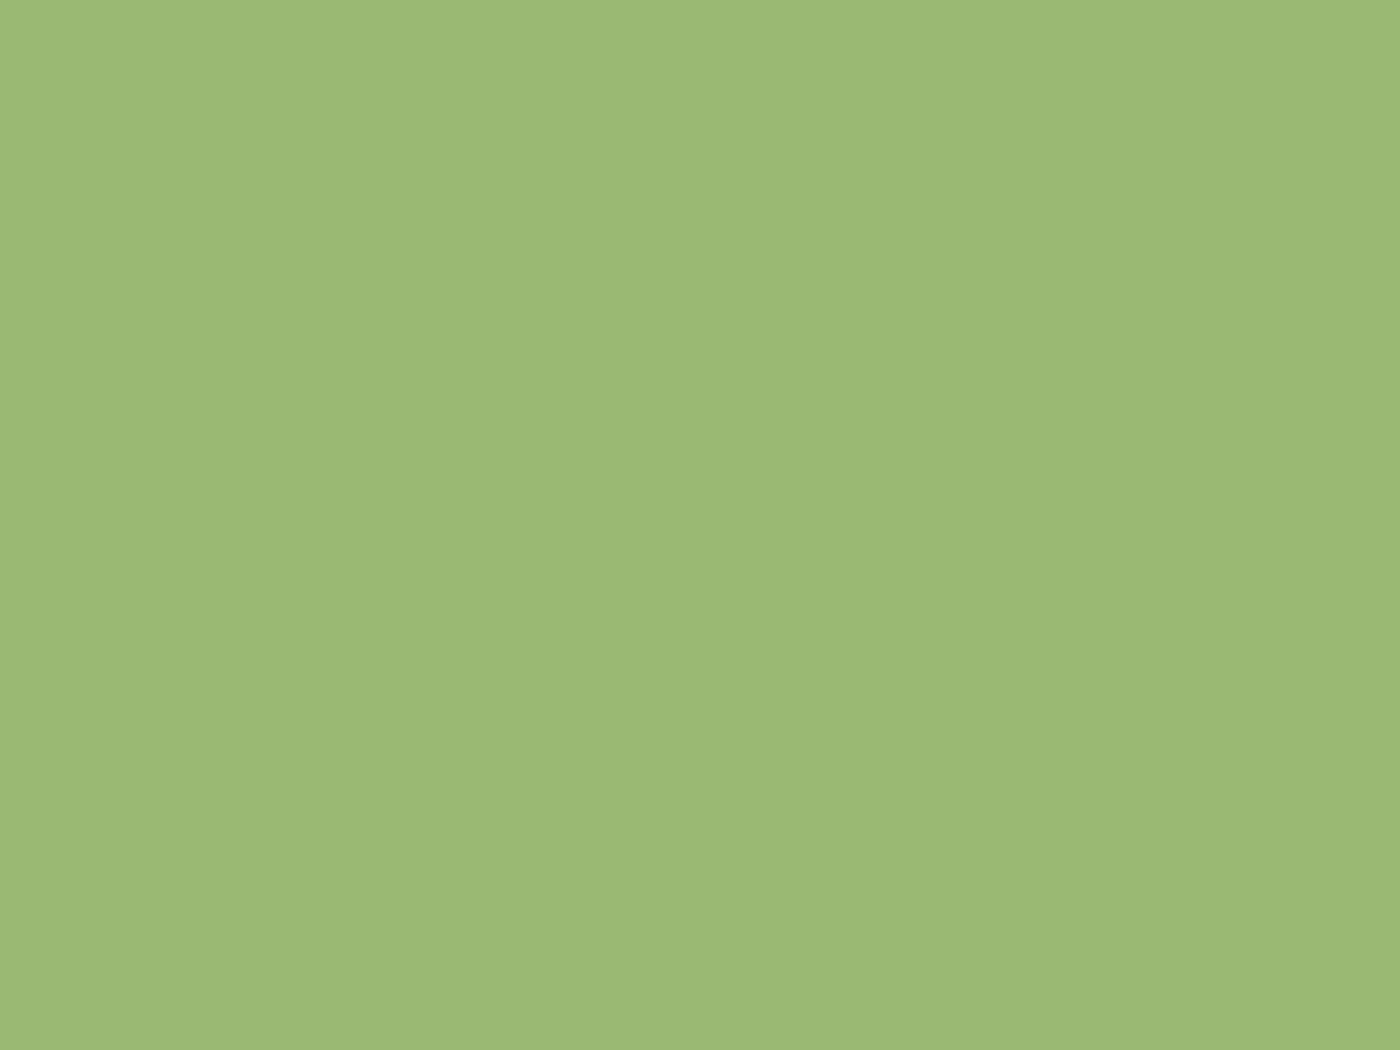 1400x1050 Olivine Solid Color Background